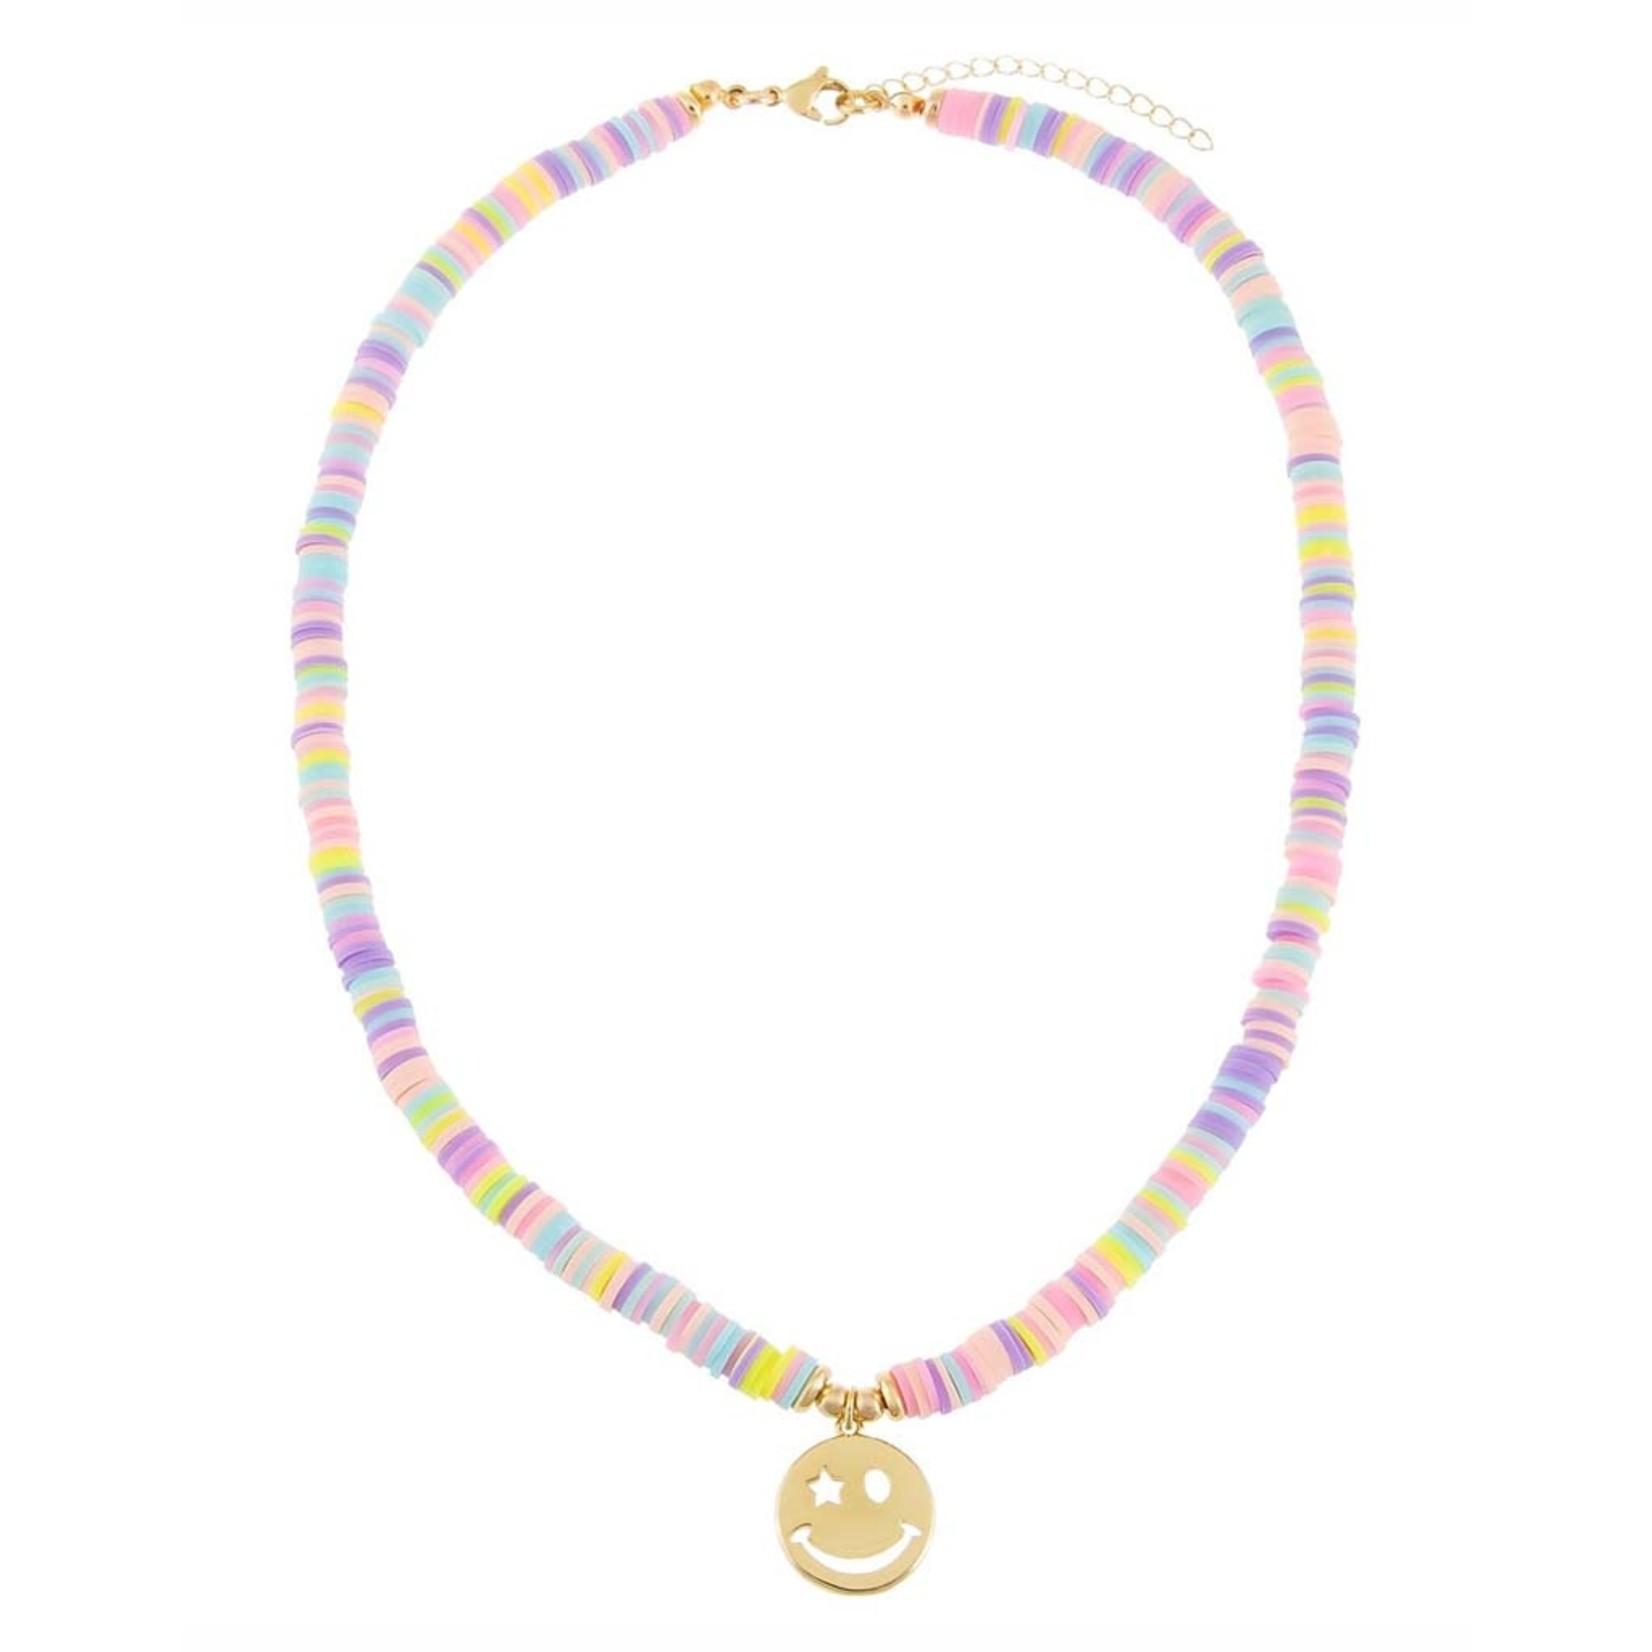 Adinas Pastel Multi Color Bead Smiley Face Necklace